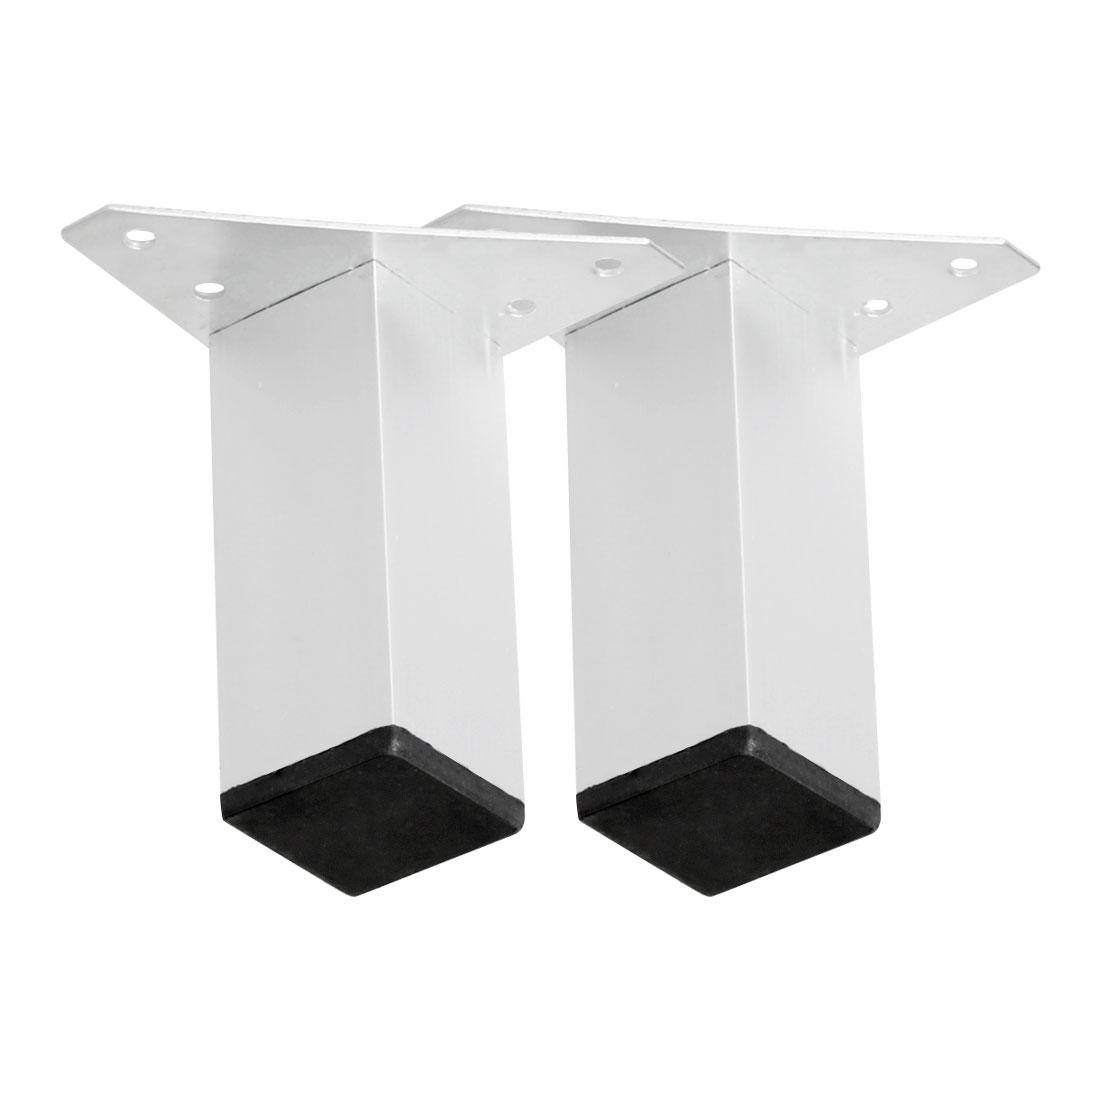 "4"" Furniture Legs Aluminium Alloy Sofa Feet Replacement Height Adjuster 2pcs"